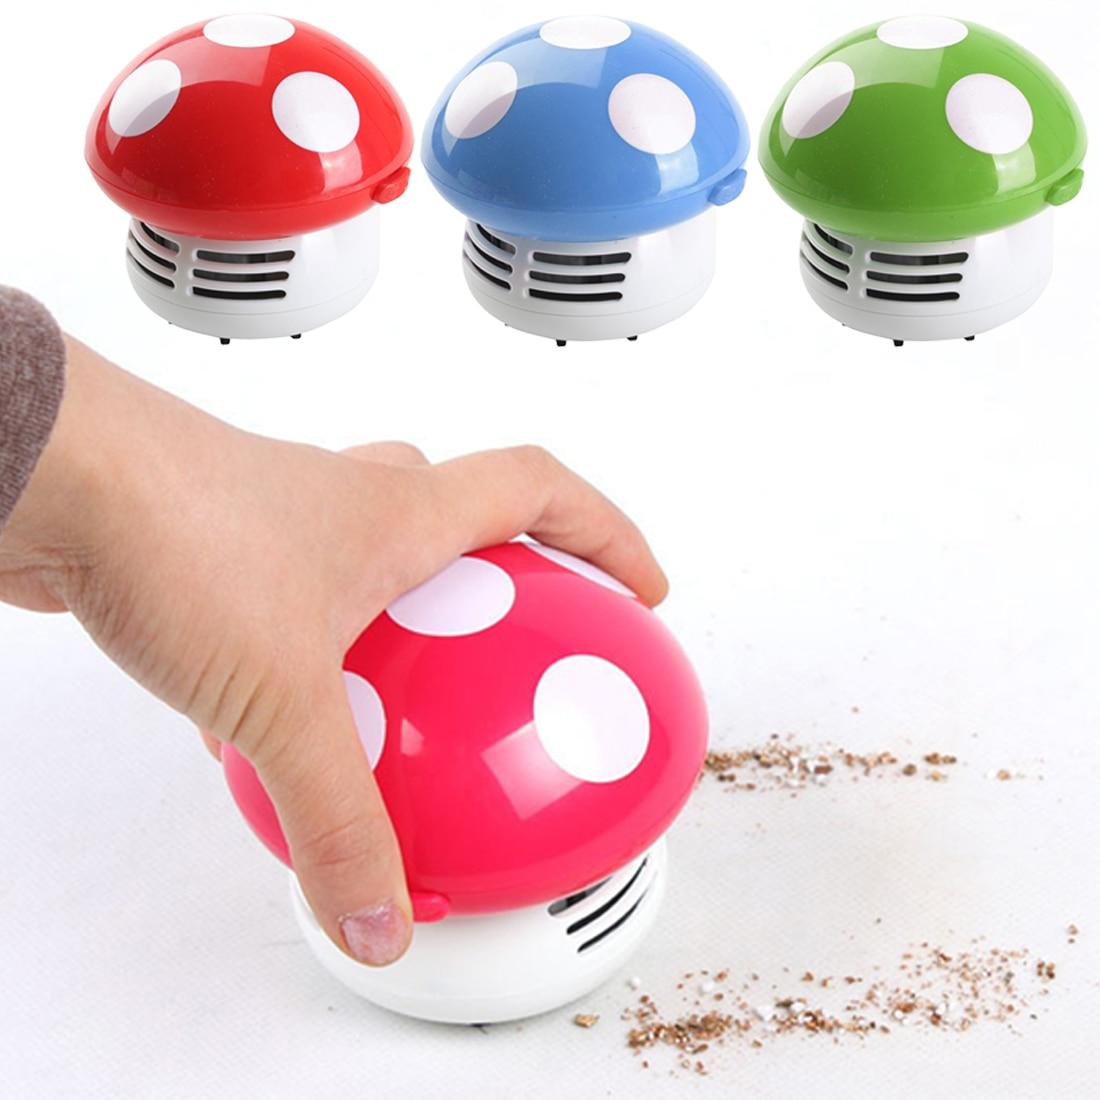 1 unidad de aspiradora de polvo para mesa de escritorio, limpiadora de esquinas, adorable Mini hongo